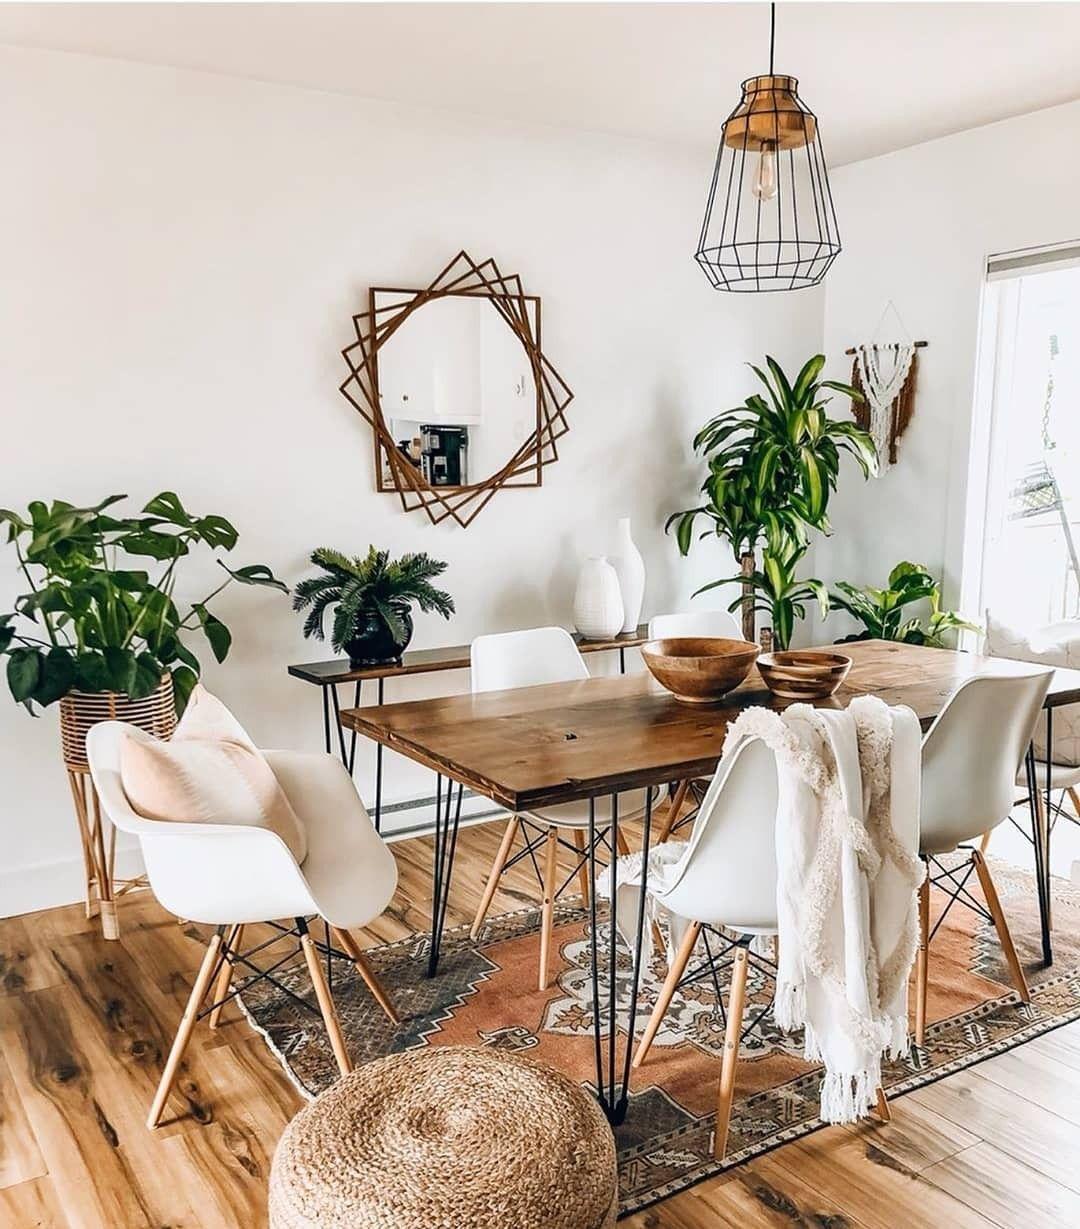 New Stylish Bohemian Home Decor And Design Ideas Home Decor House Interior Aesthetic Room Decor